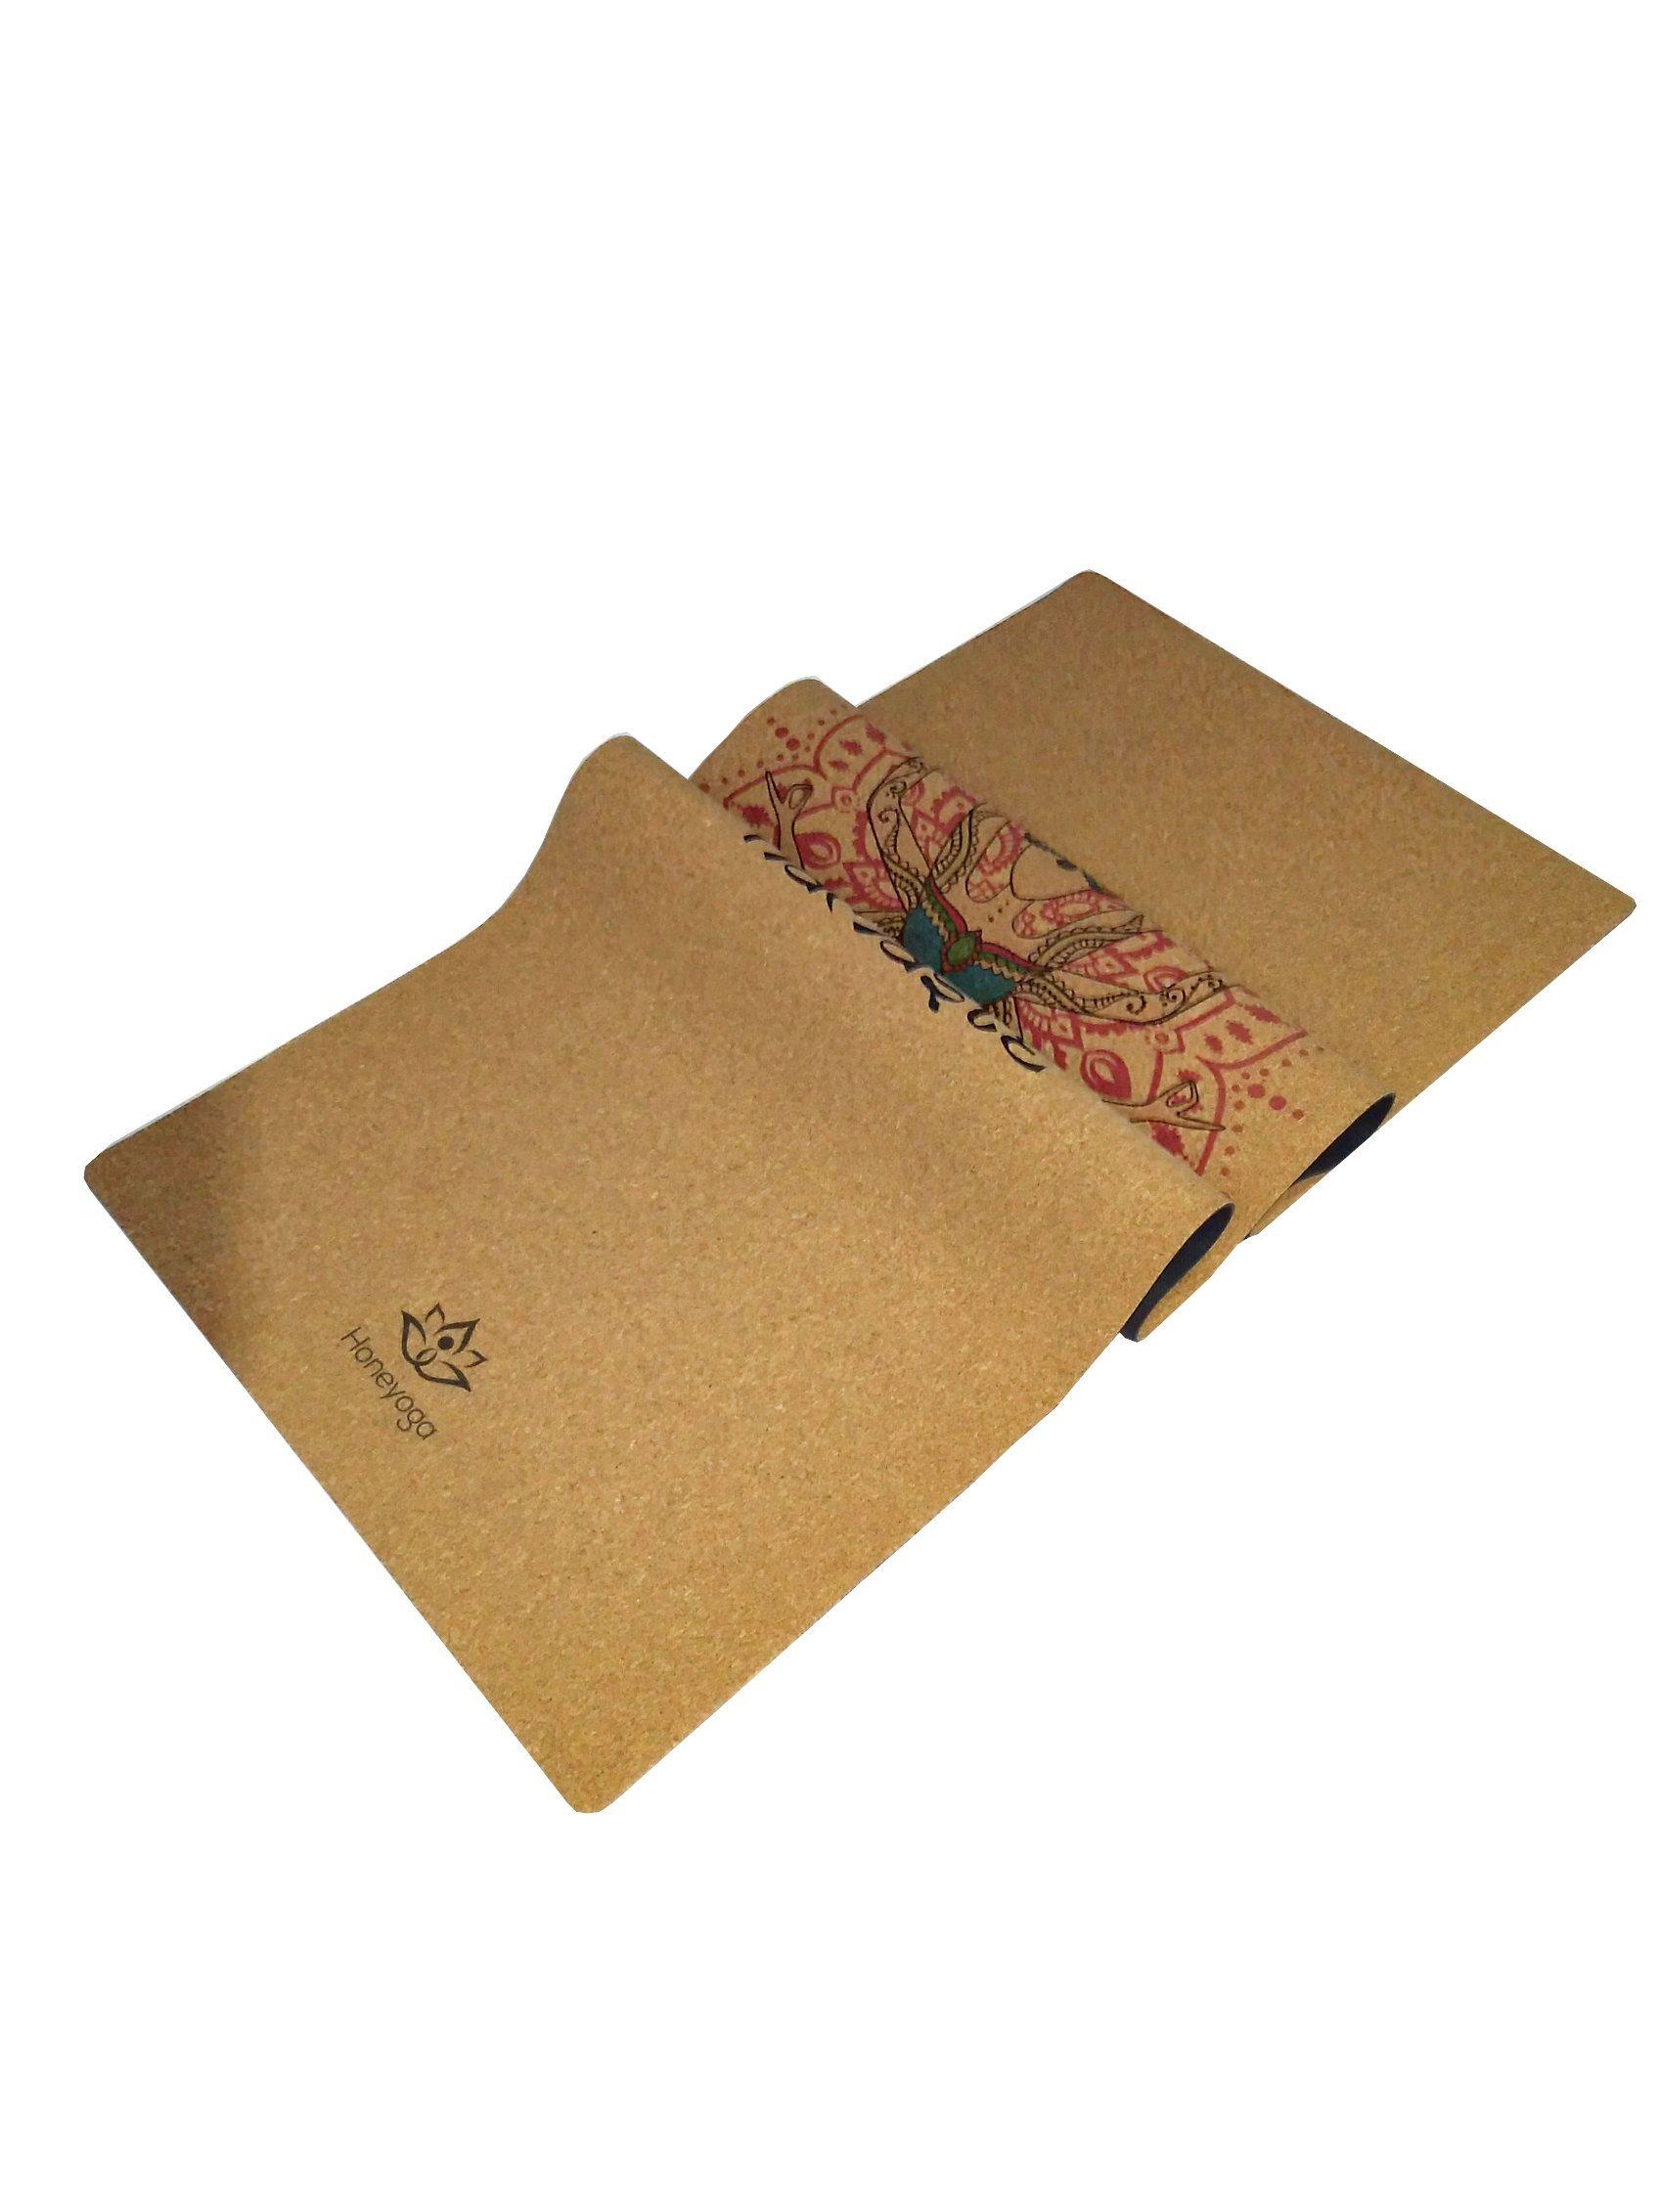 Travel Cork Yoga Mat + Natural Rubber Portable Light Ultimate Non-Slip Yoga Mats